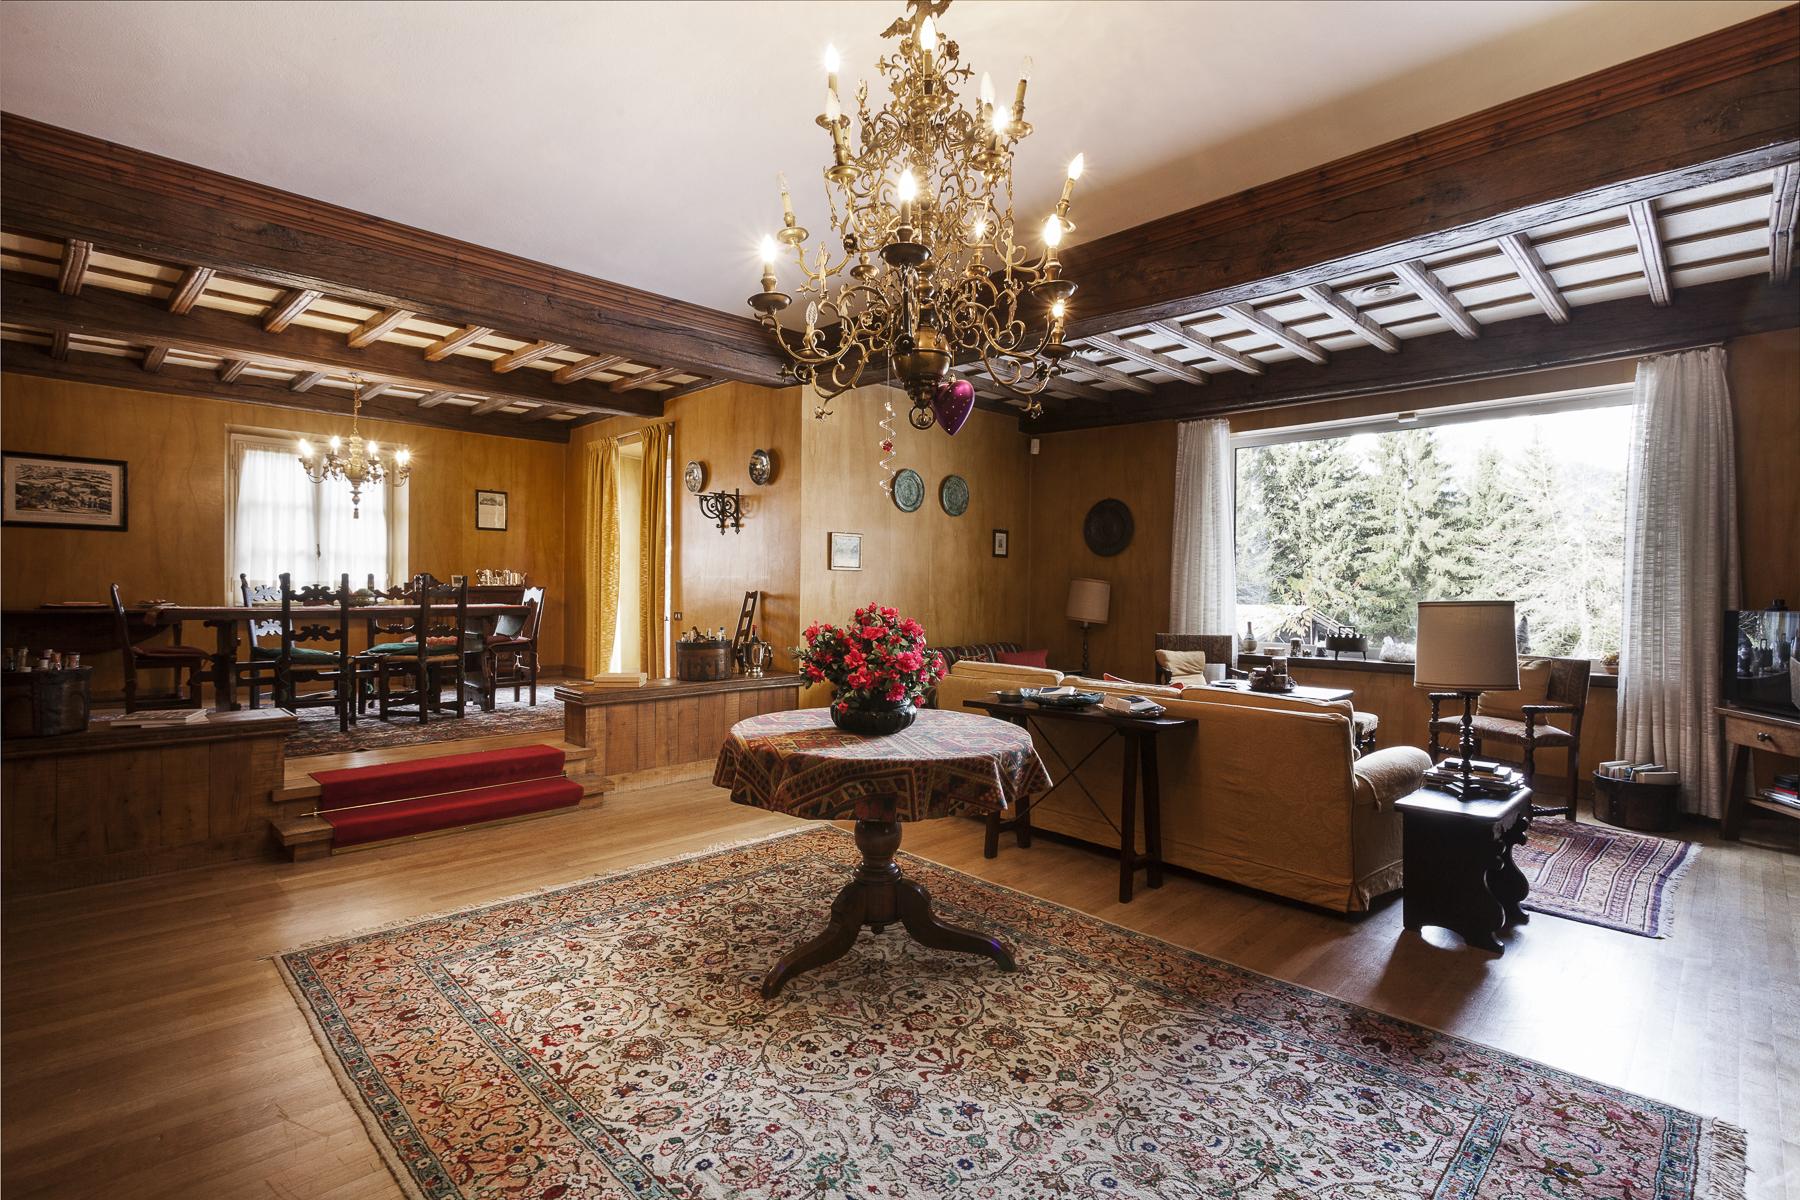 Villa in Vendita a Courmayeur: 5 locali, 900 mq - Foto 2